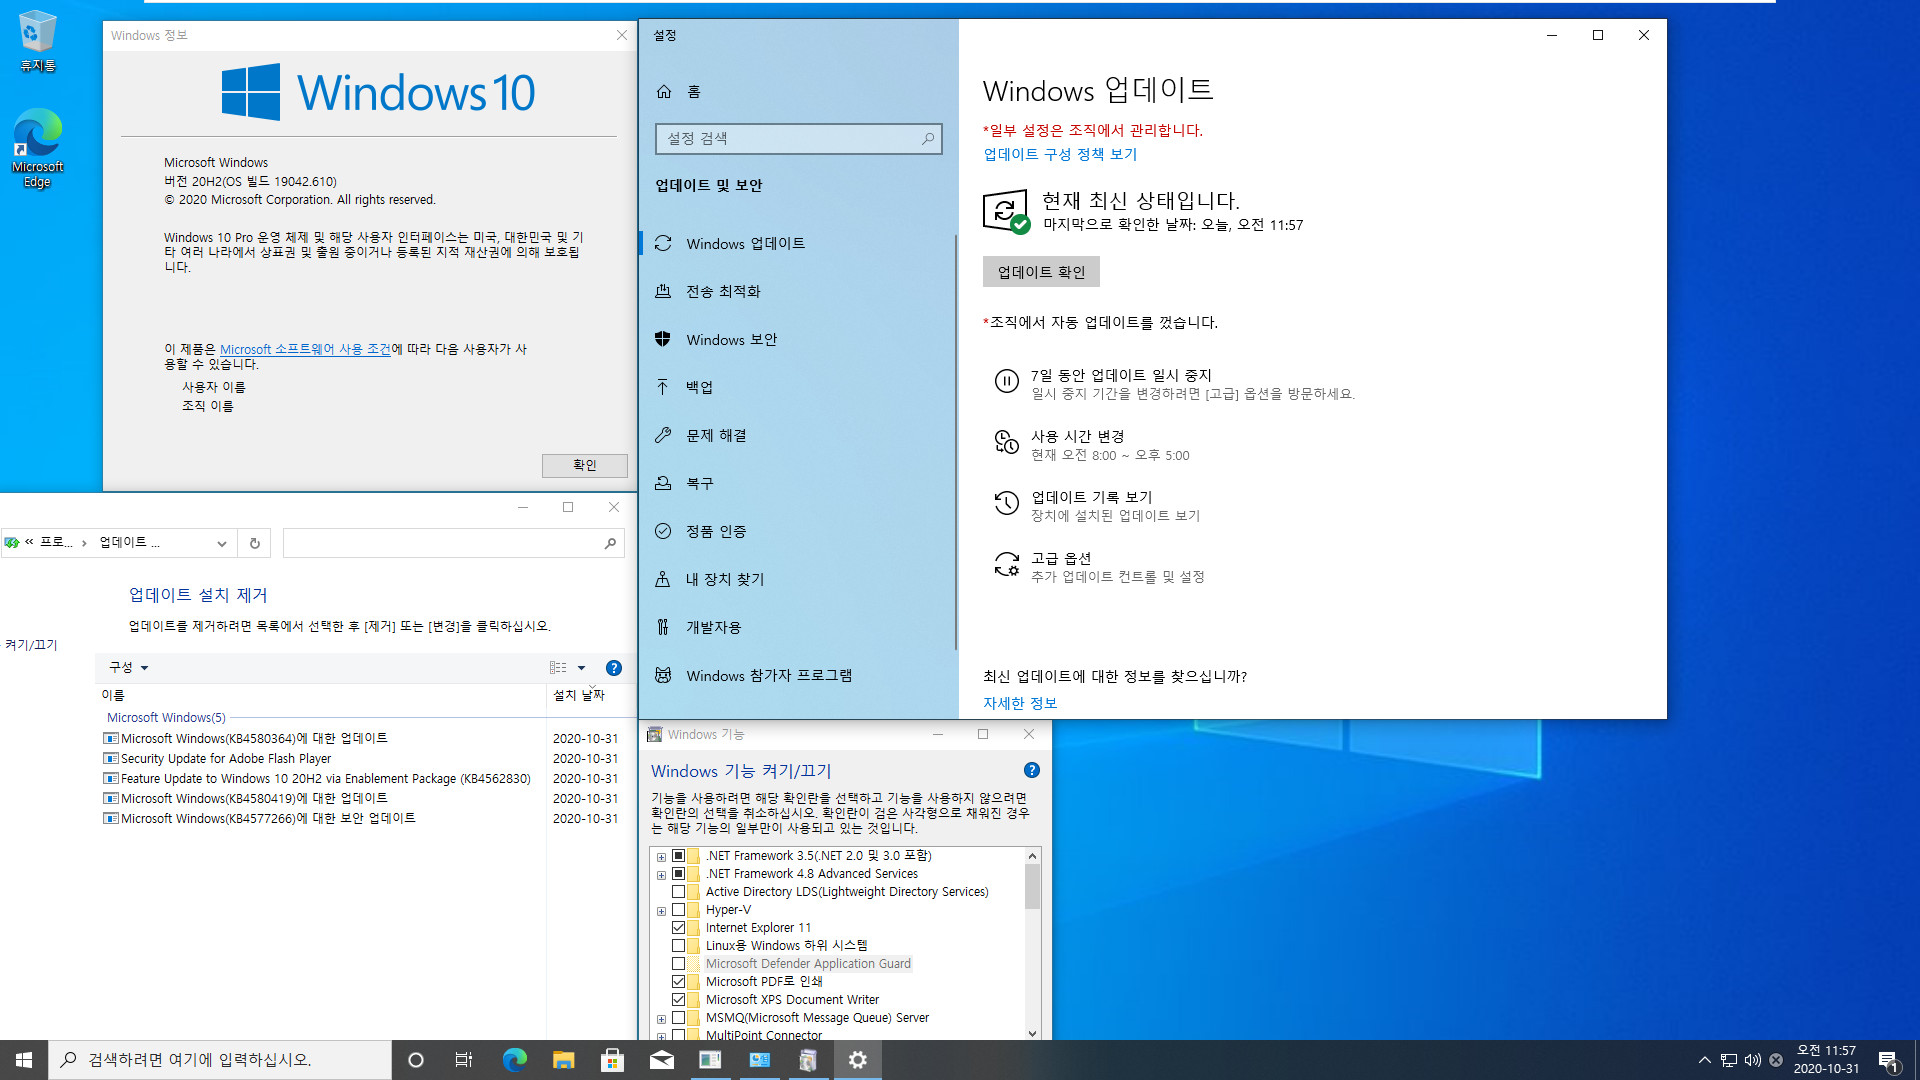 Windows 10 업데이트 설치하기.bat 으로 일괄 설치하기 - 서비스 스택 업데이트만 앞에 1 붙여서 먼저 설치되게 하면 전부 설치됩니다 2020-10-31_115721.jpg